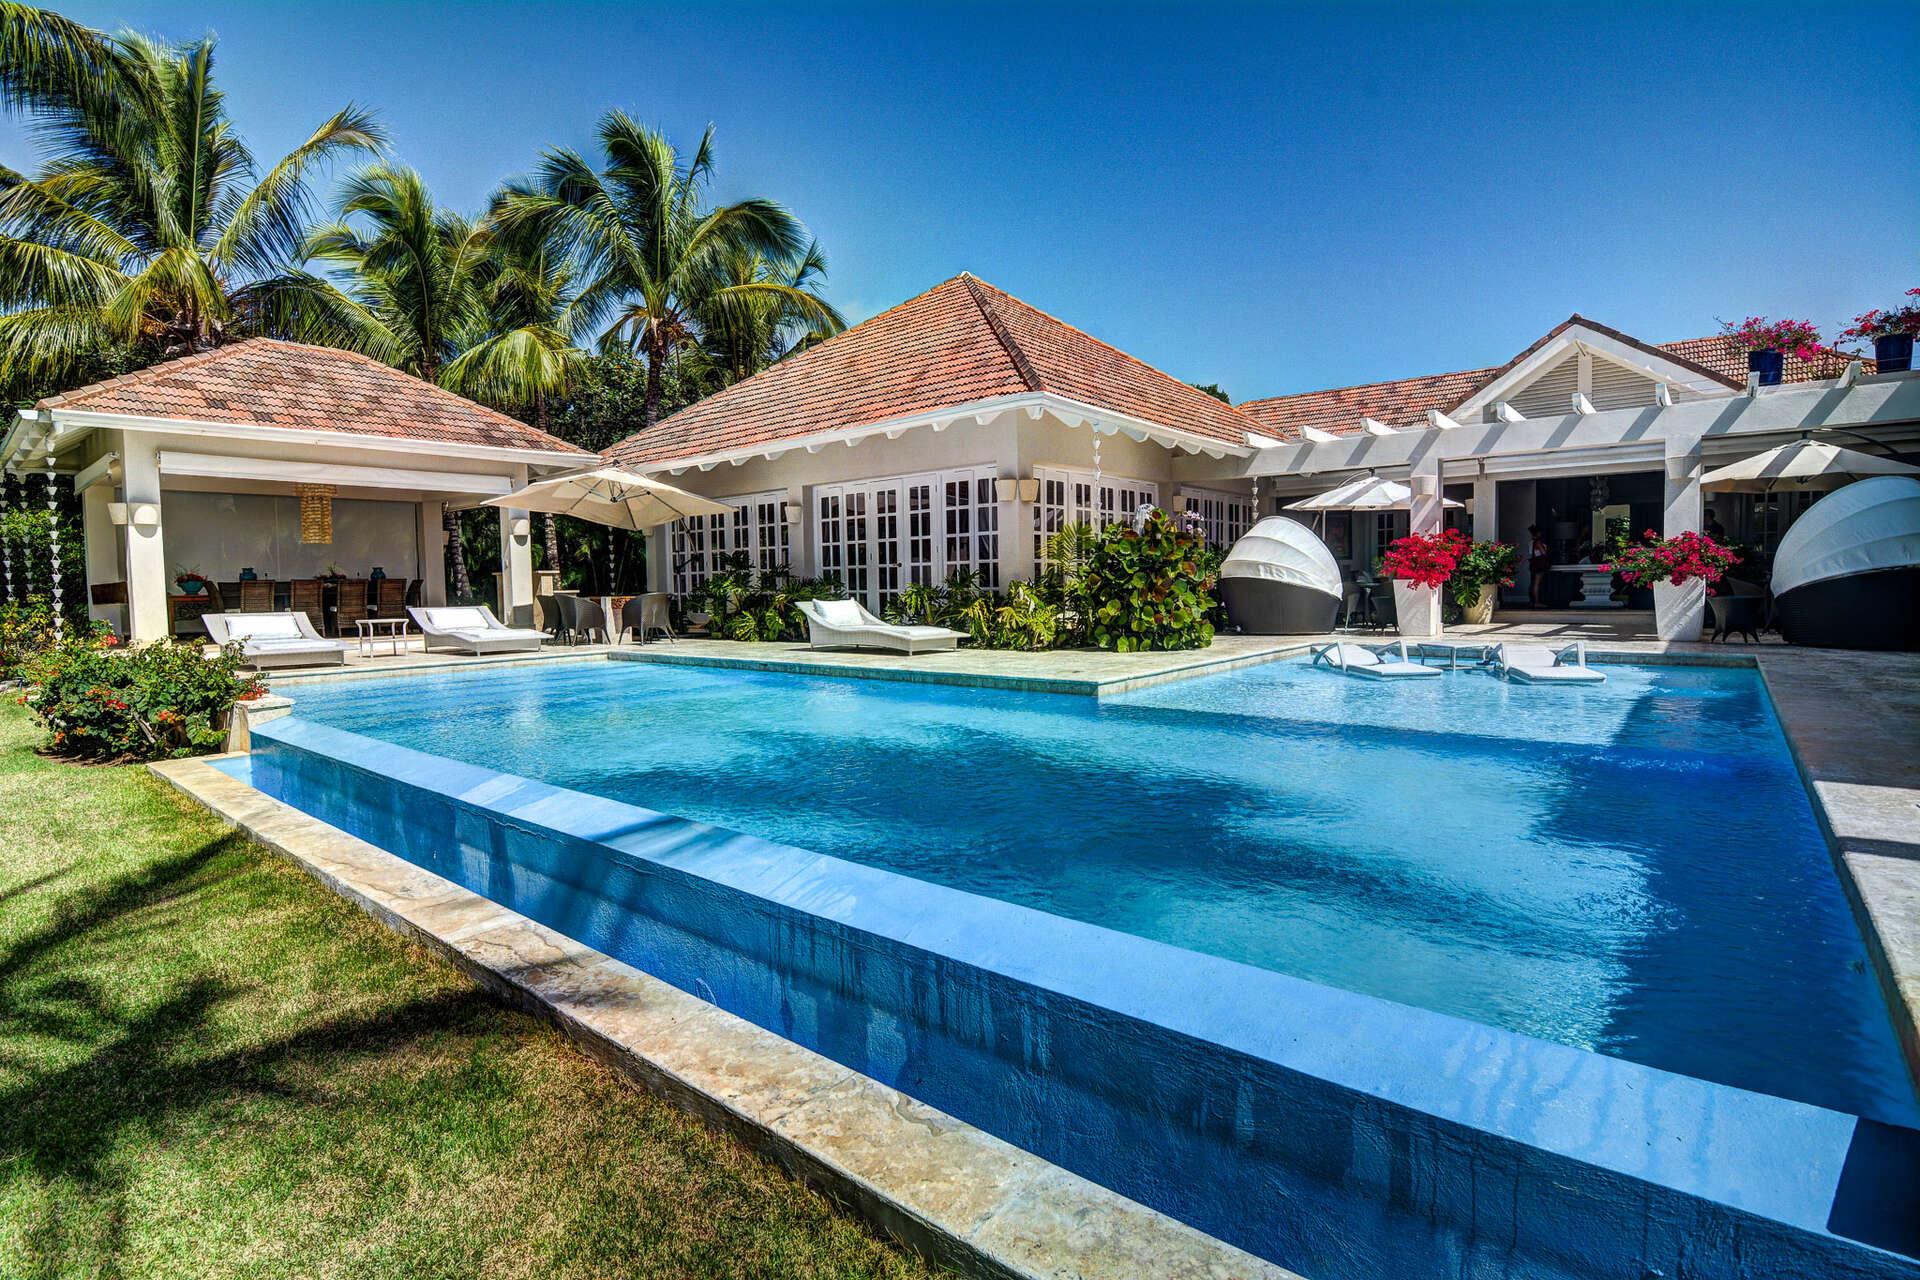 Luxury villa rentals caribbean - Dominican republic - Punta cana - Punta cana resort and club - Tortuga D1 - Image 1/31